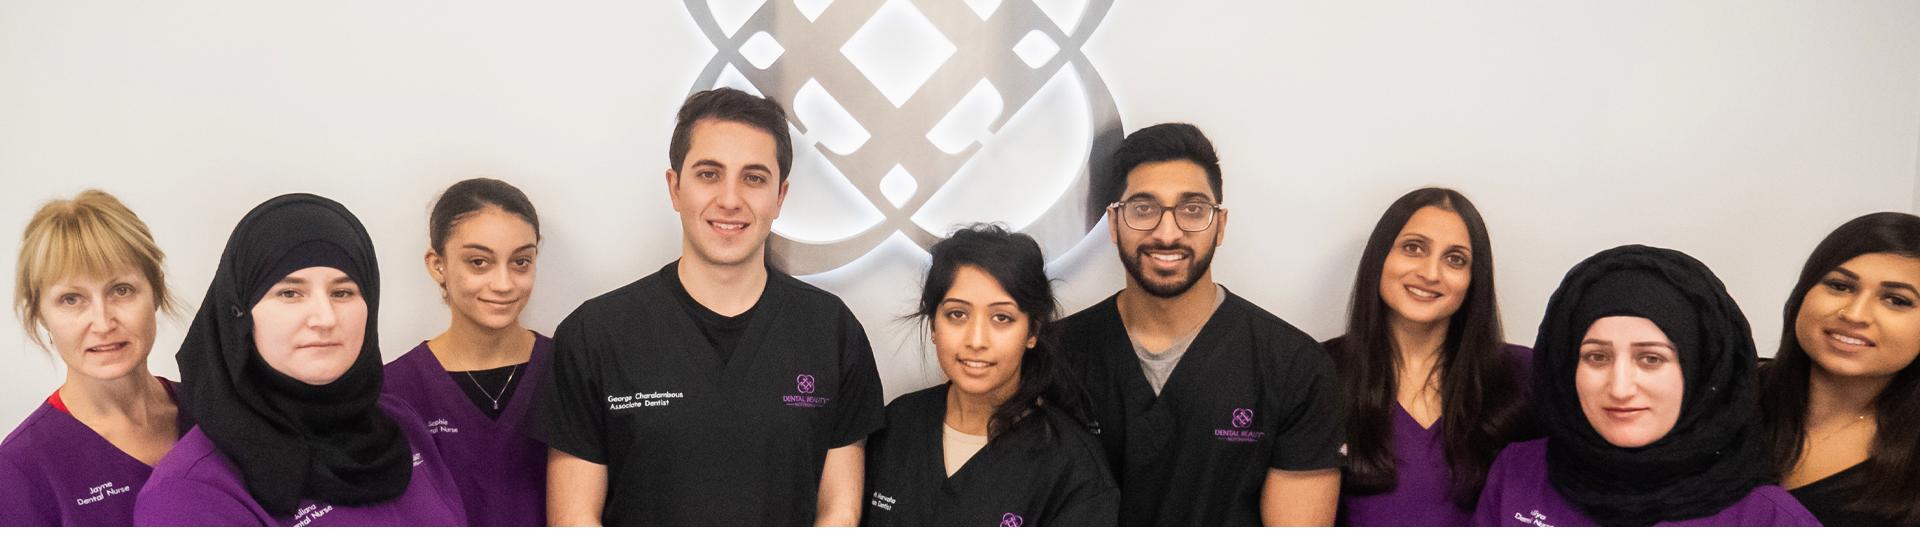 dental beauty london dental team